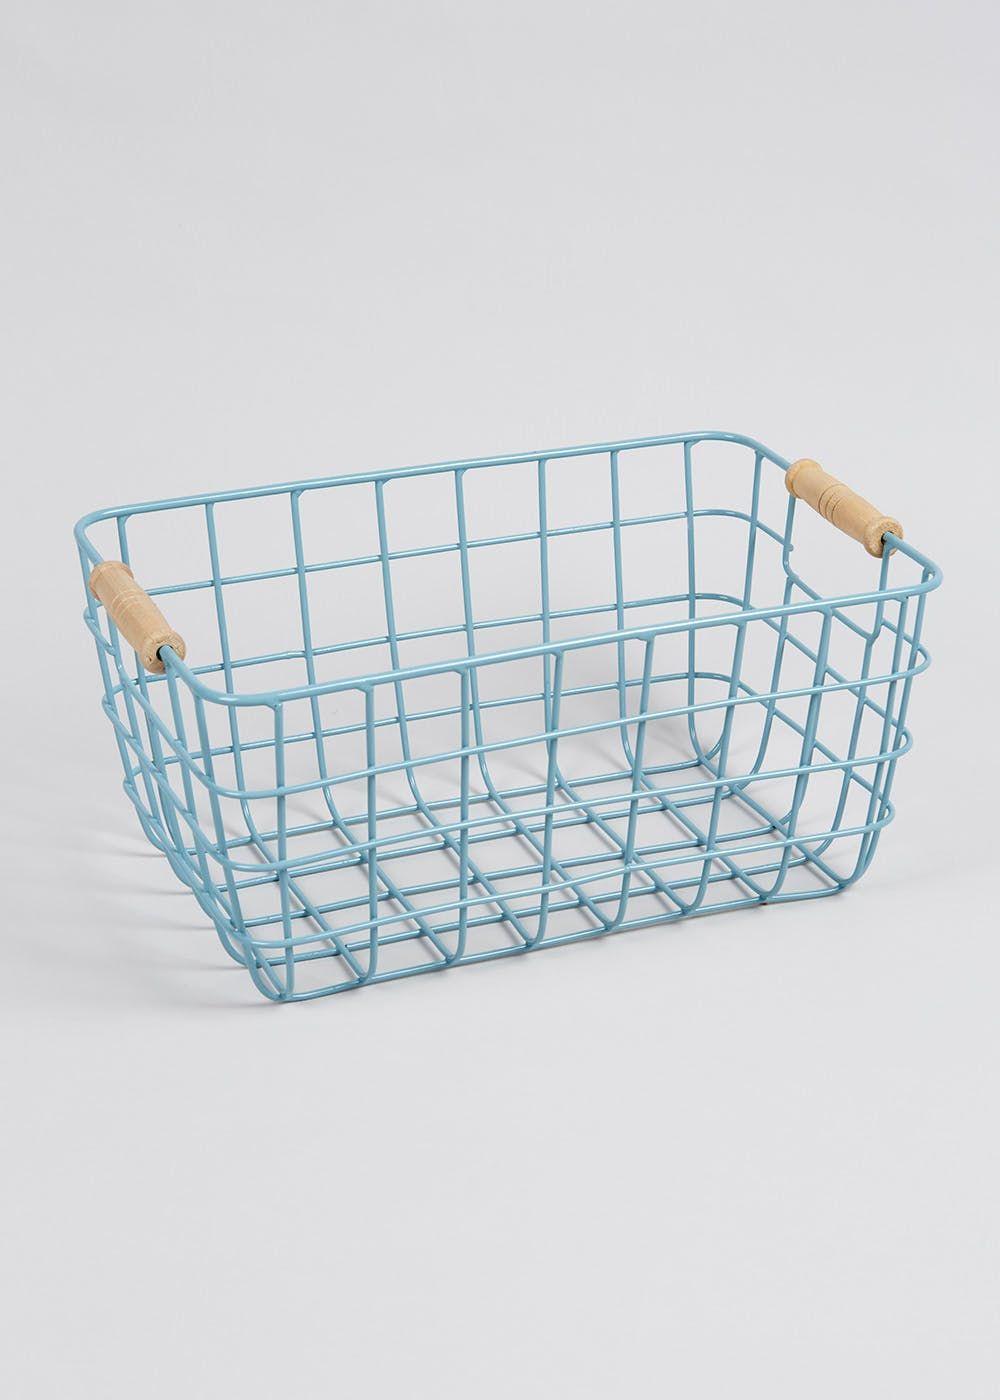 Metal Basket (30cm x 20cm) | Online house idease | Pinterest | Metal ...